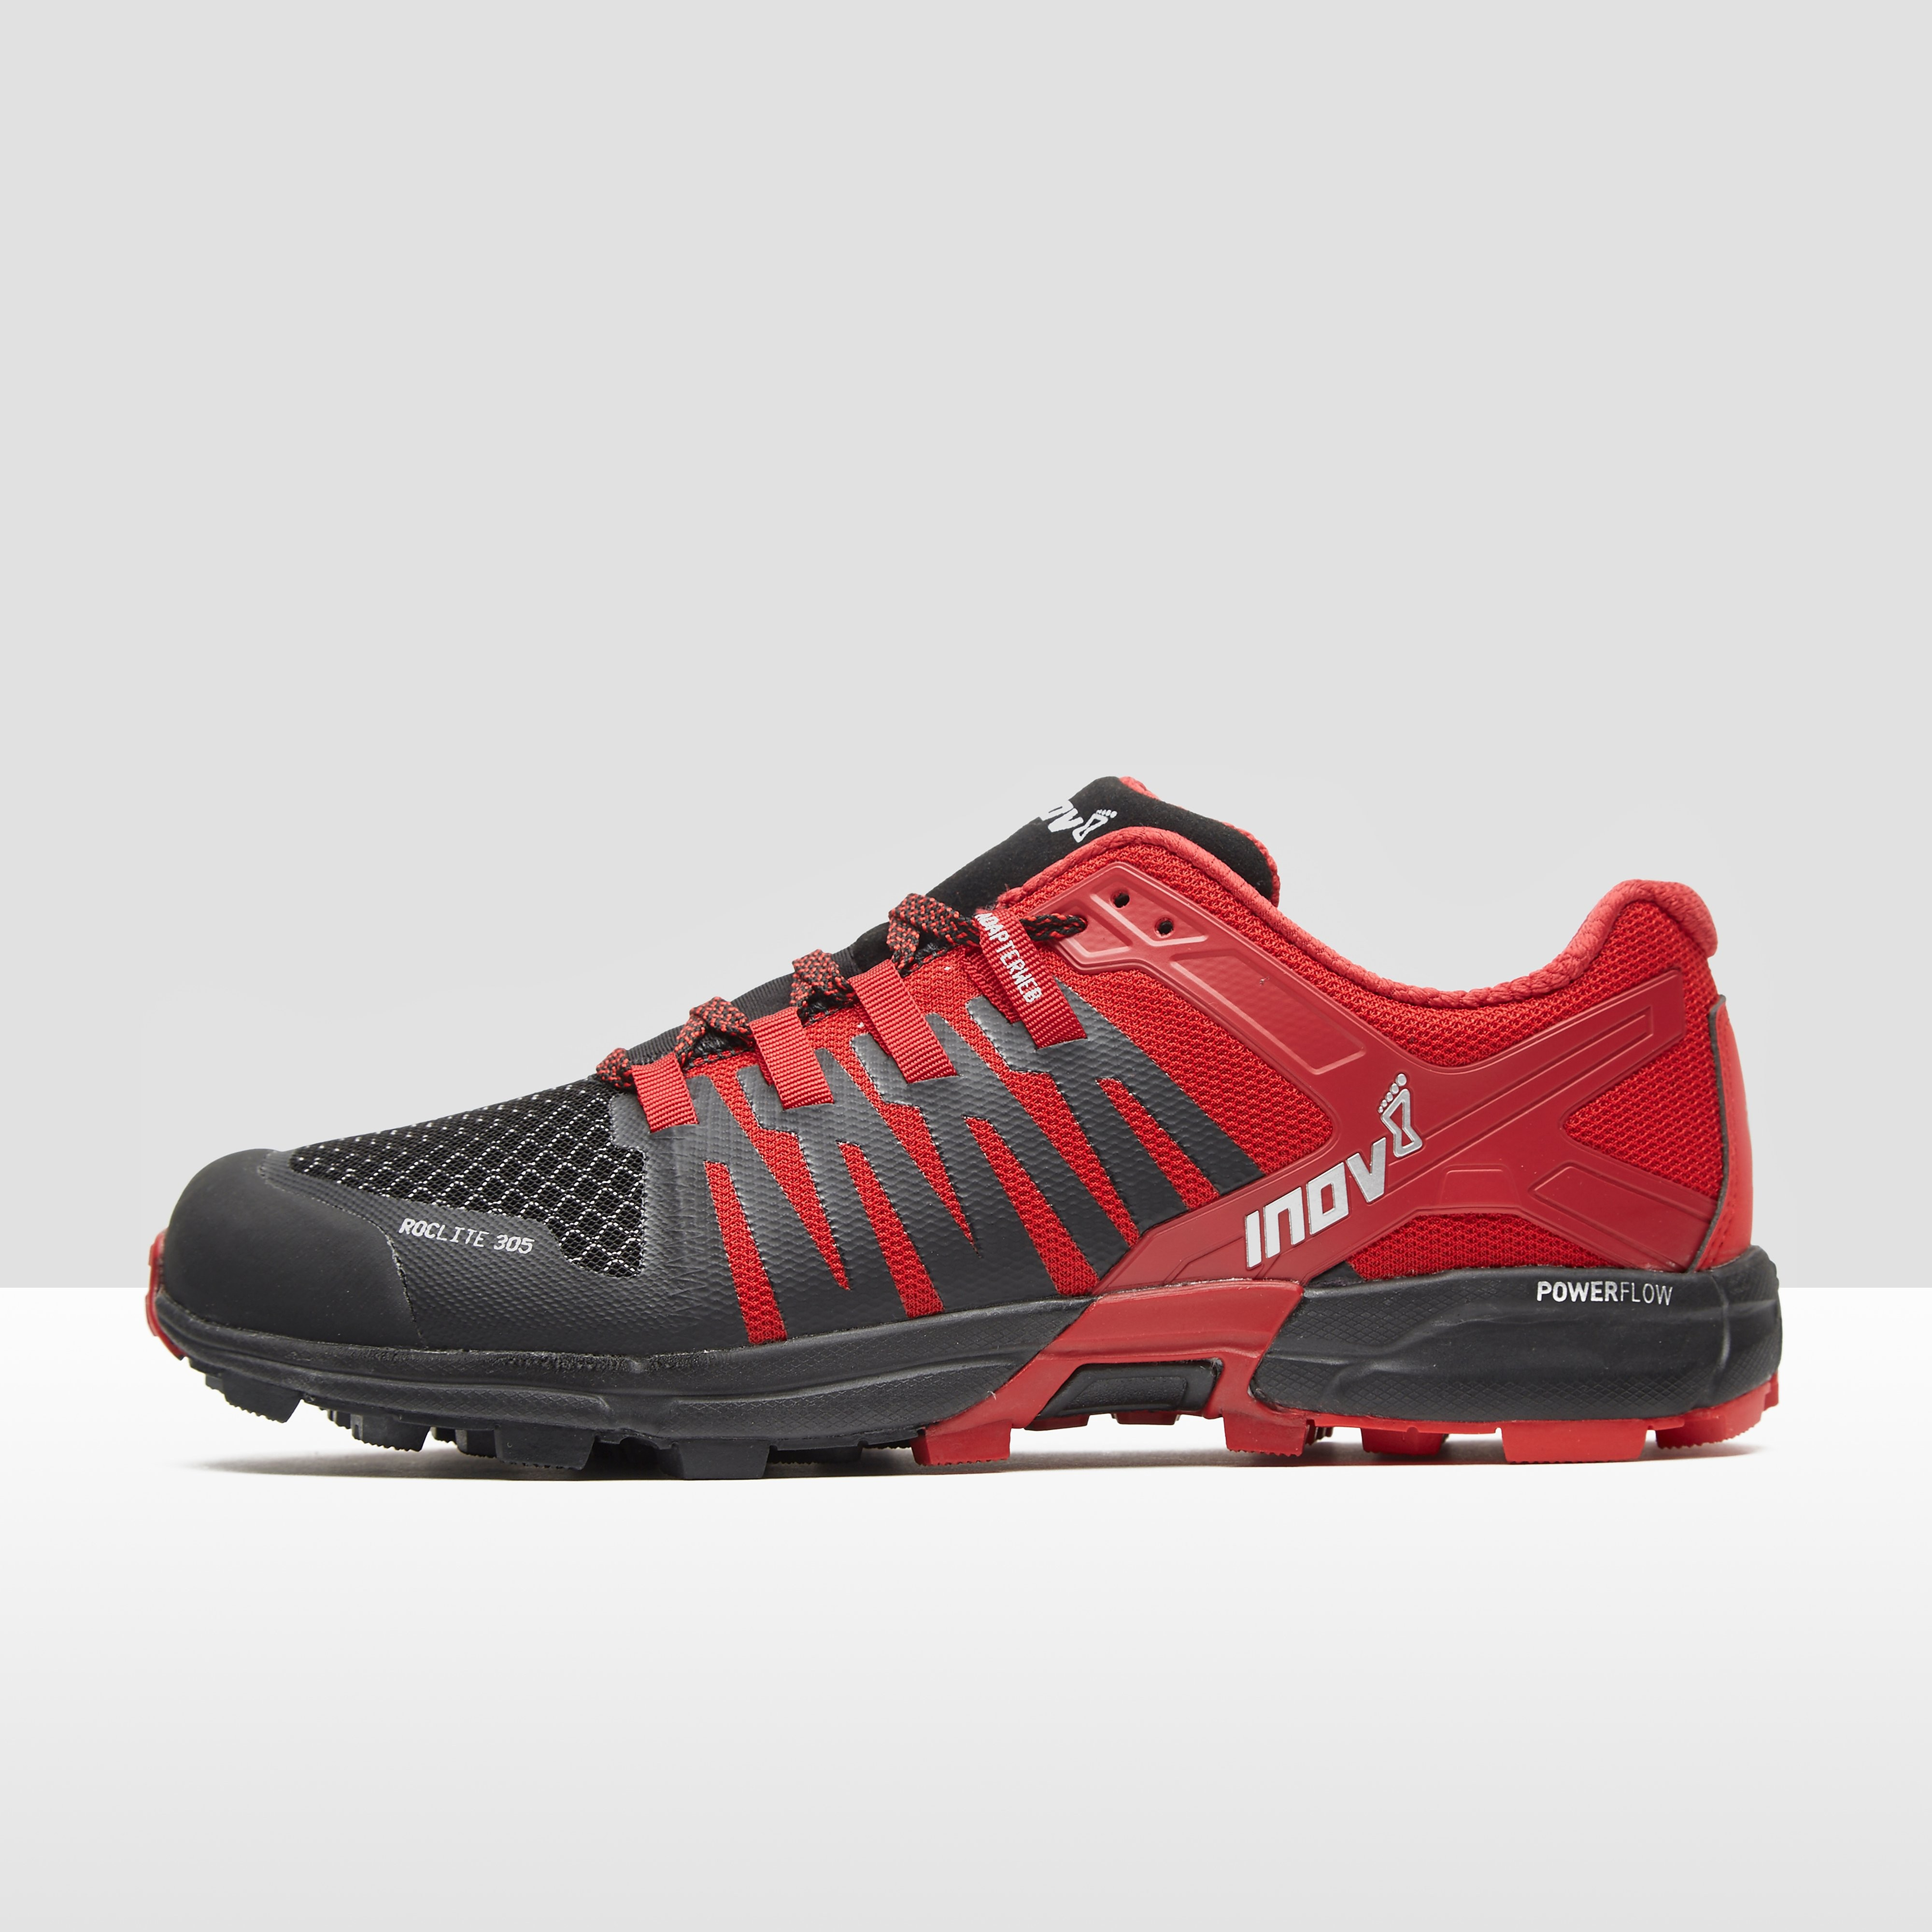 Inov-8 Roclite 305 Mens Trail Running Shoes